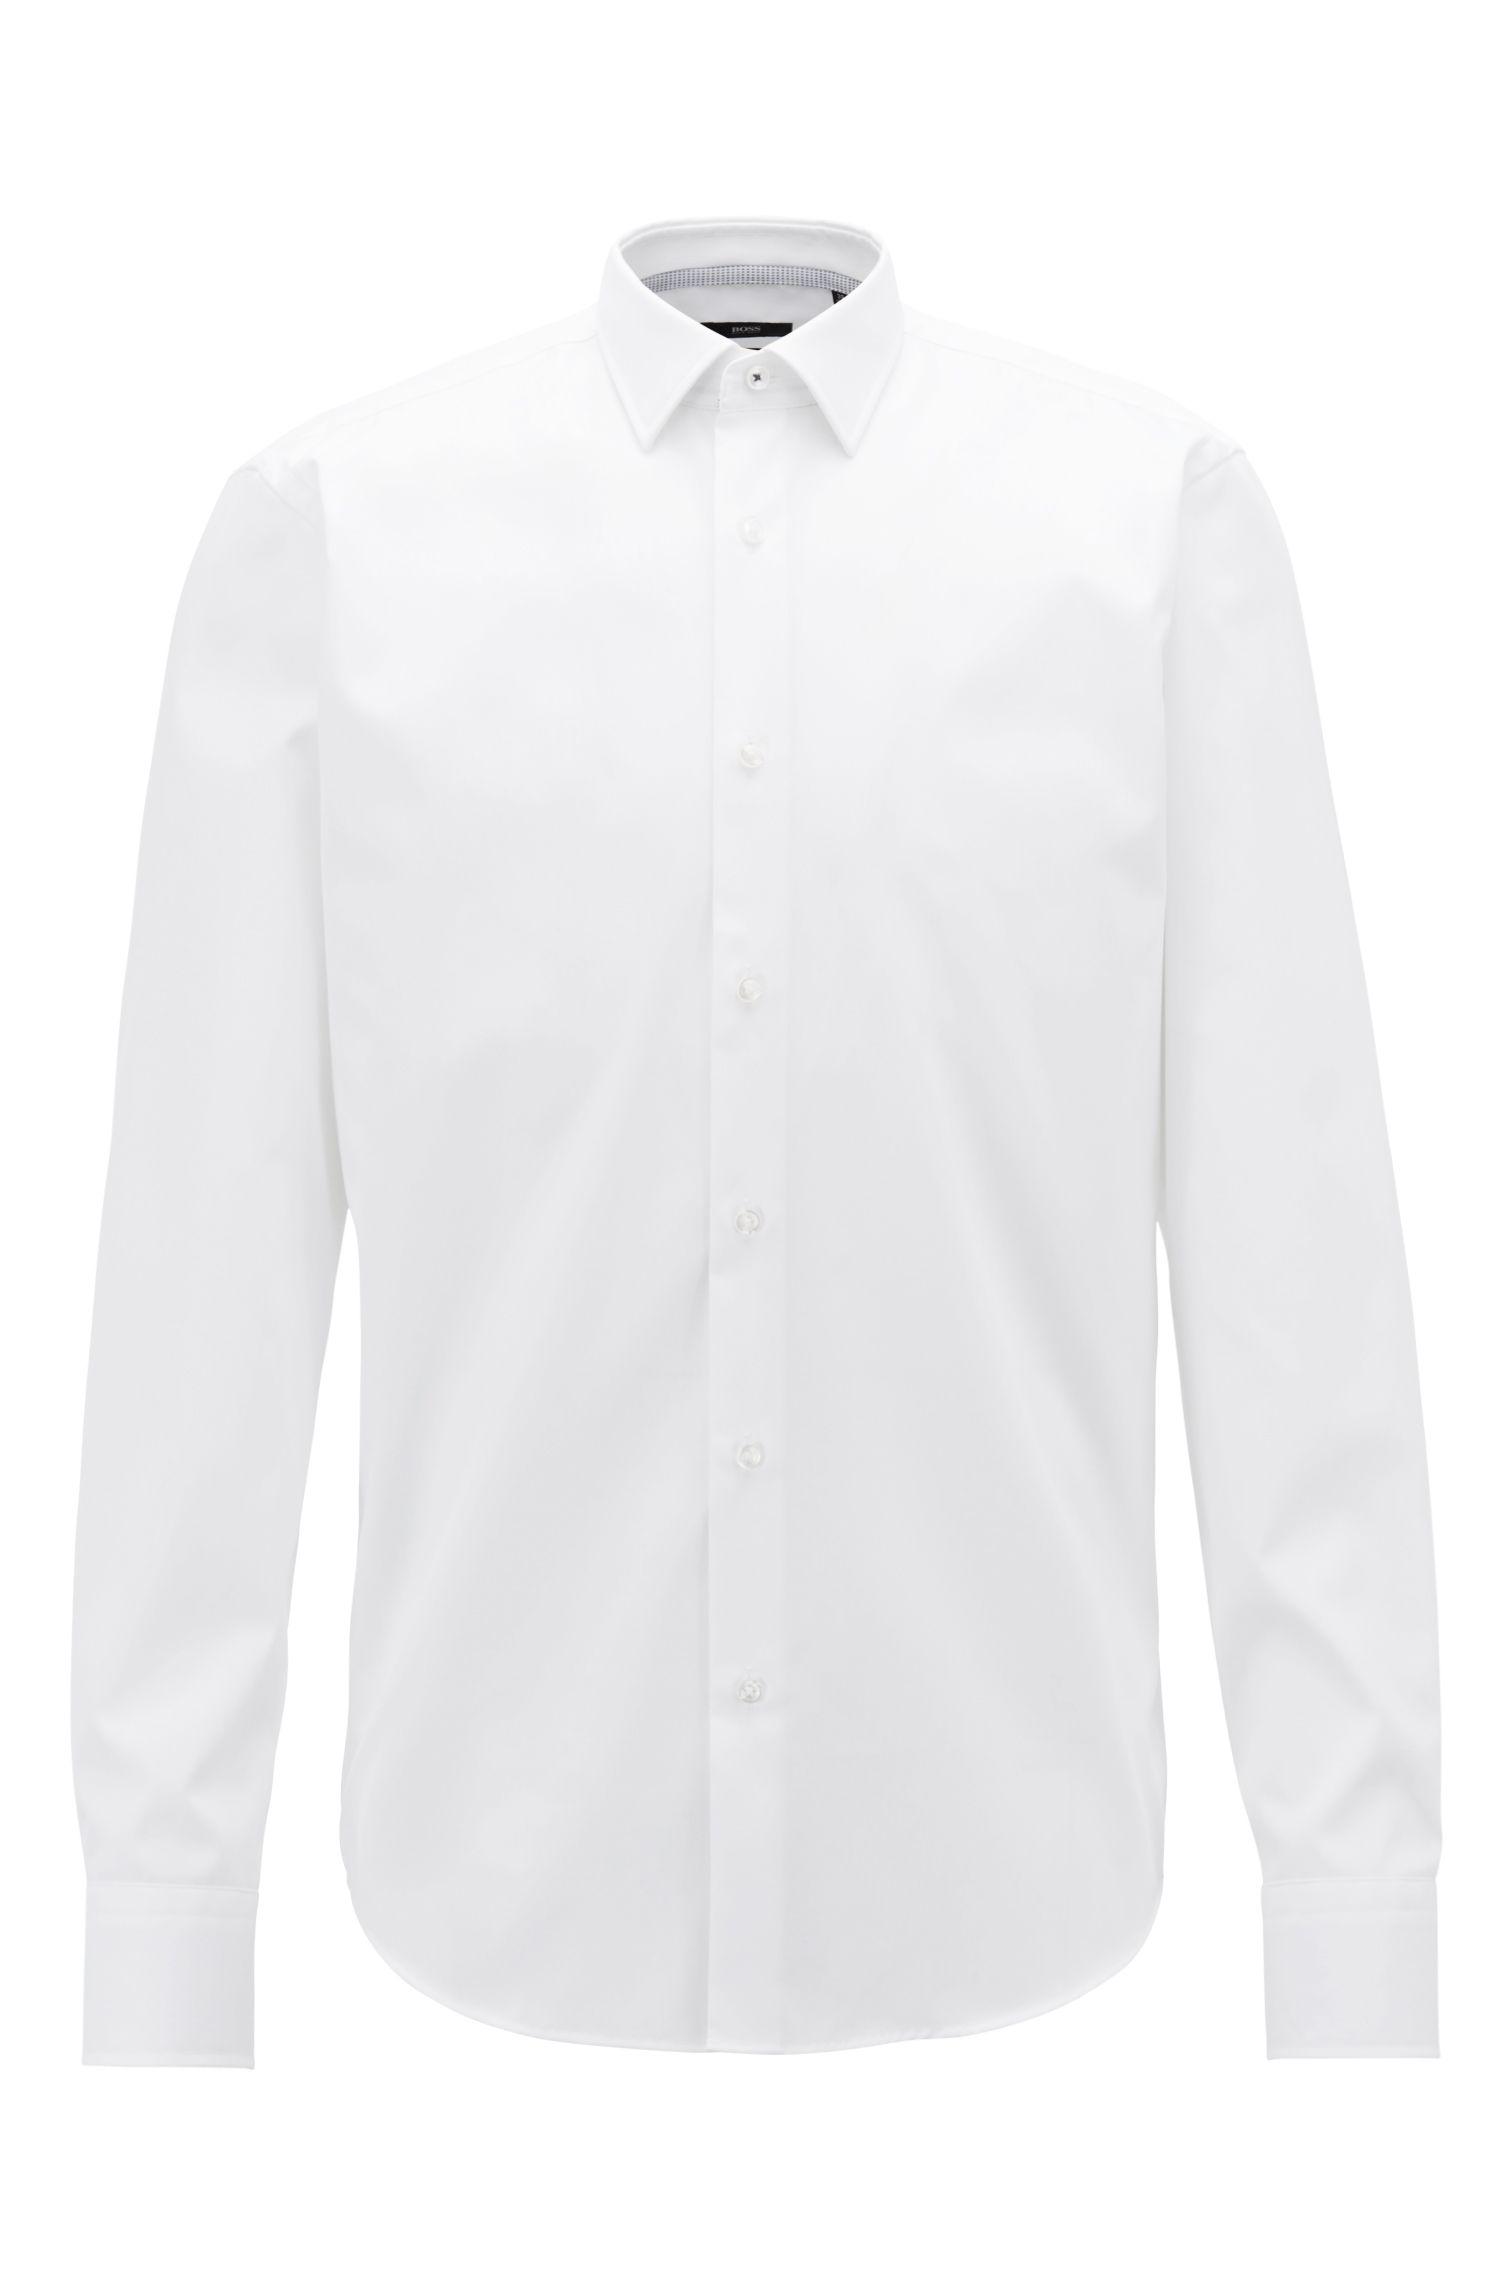 Regular-fit shirt in Austrian easy-iron cotton poplin, White